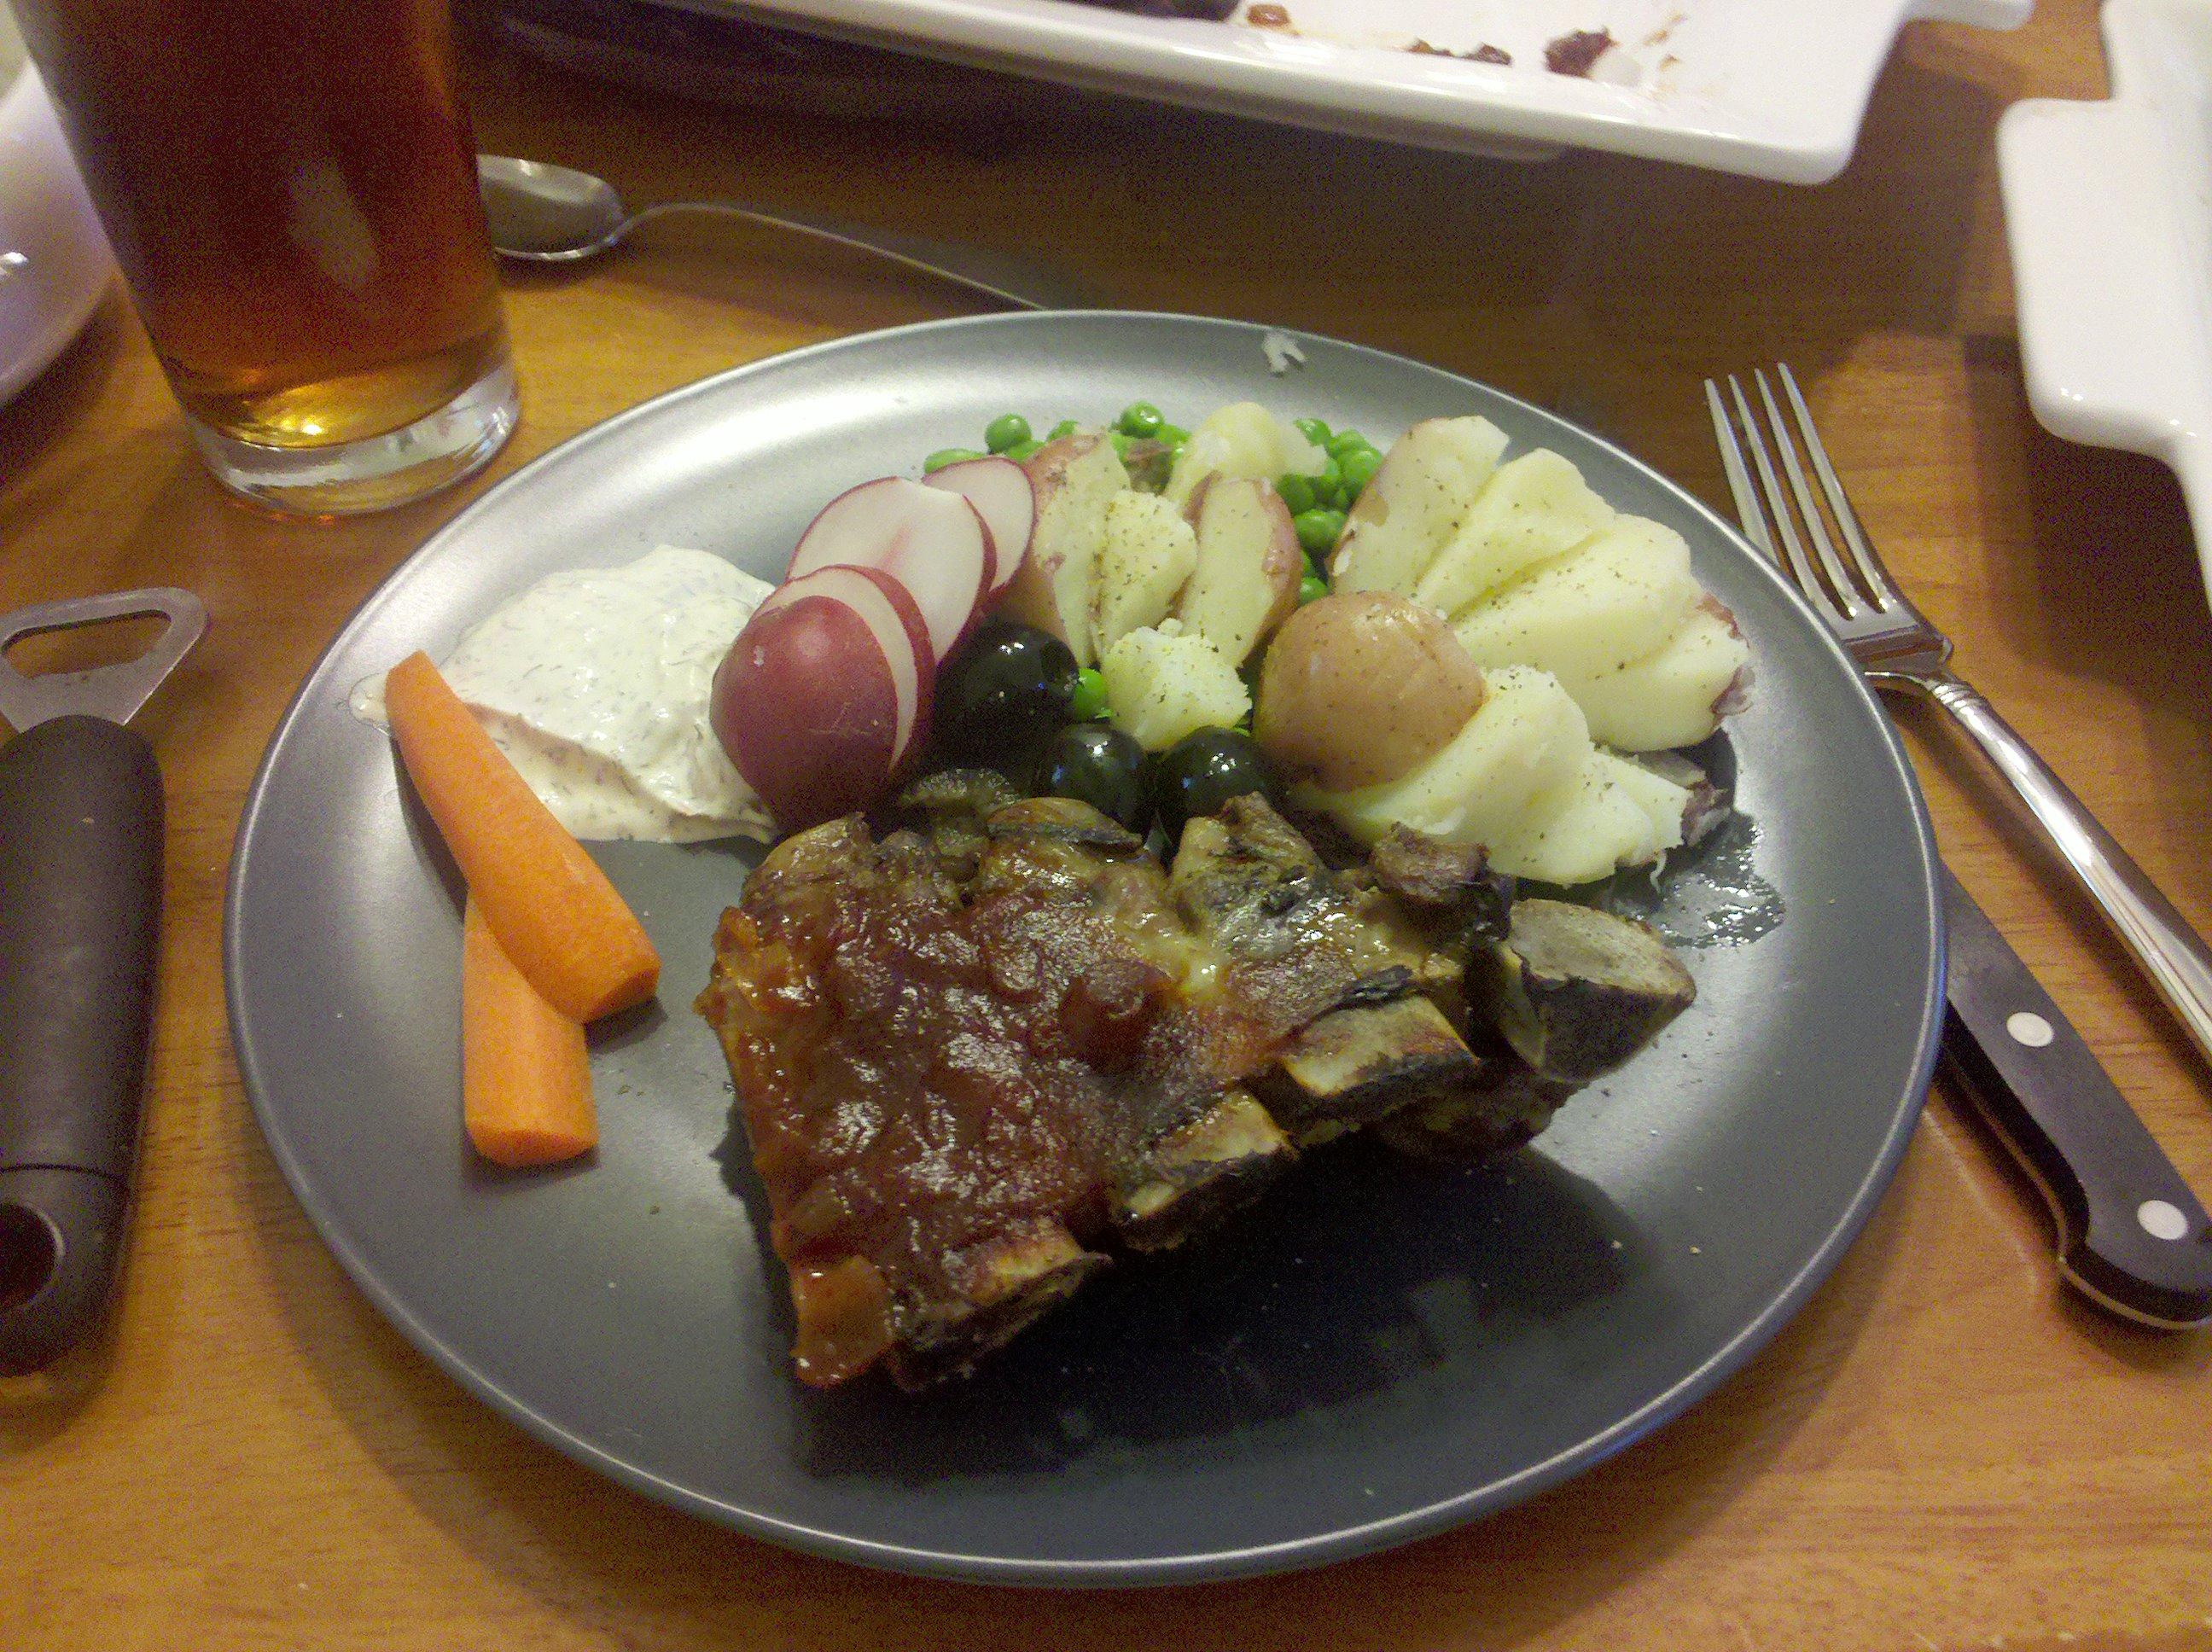 Greenbelt, MD :: Pork Ribs with Secret Sauce, Farmers Market New Potatoes with Fresh Peas, Fresh Vegetables.